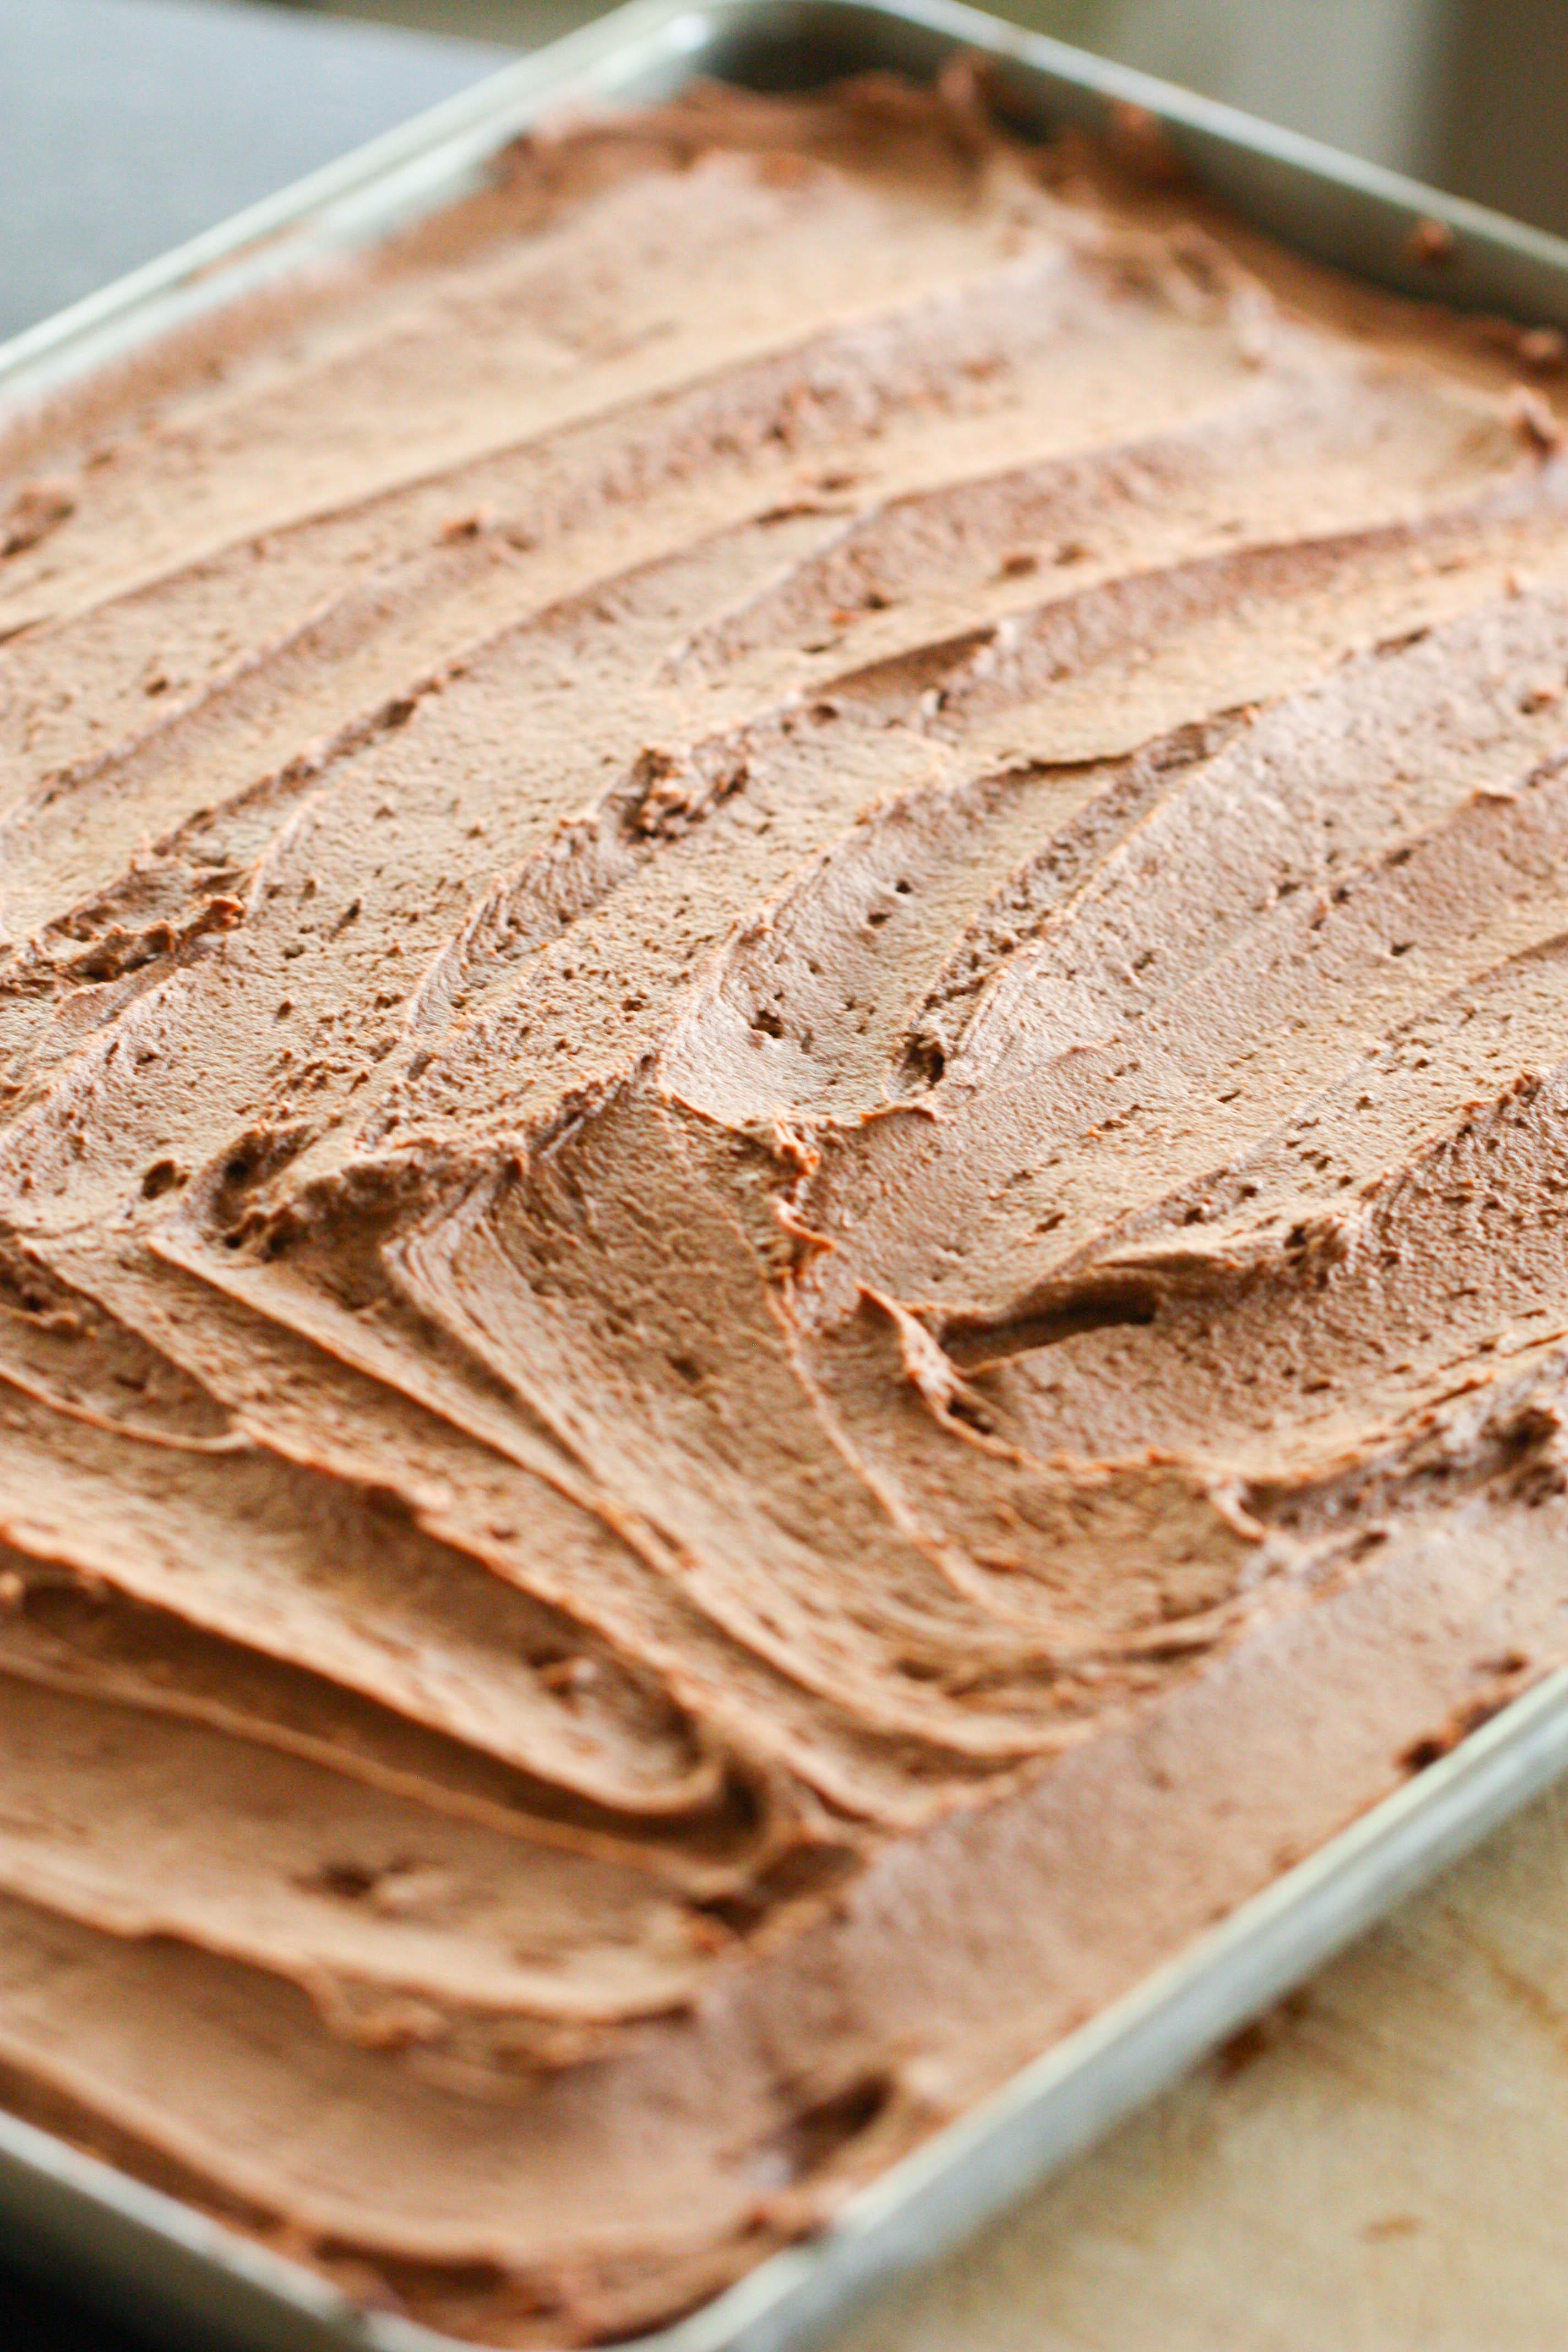 Sheet pan of Chocolate Sugar Cookie Bars